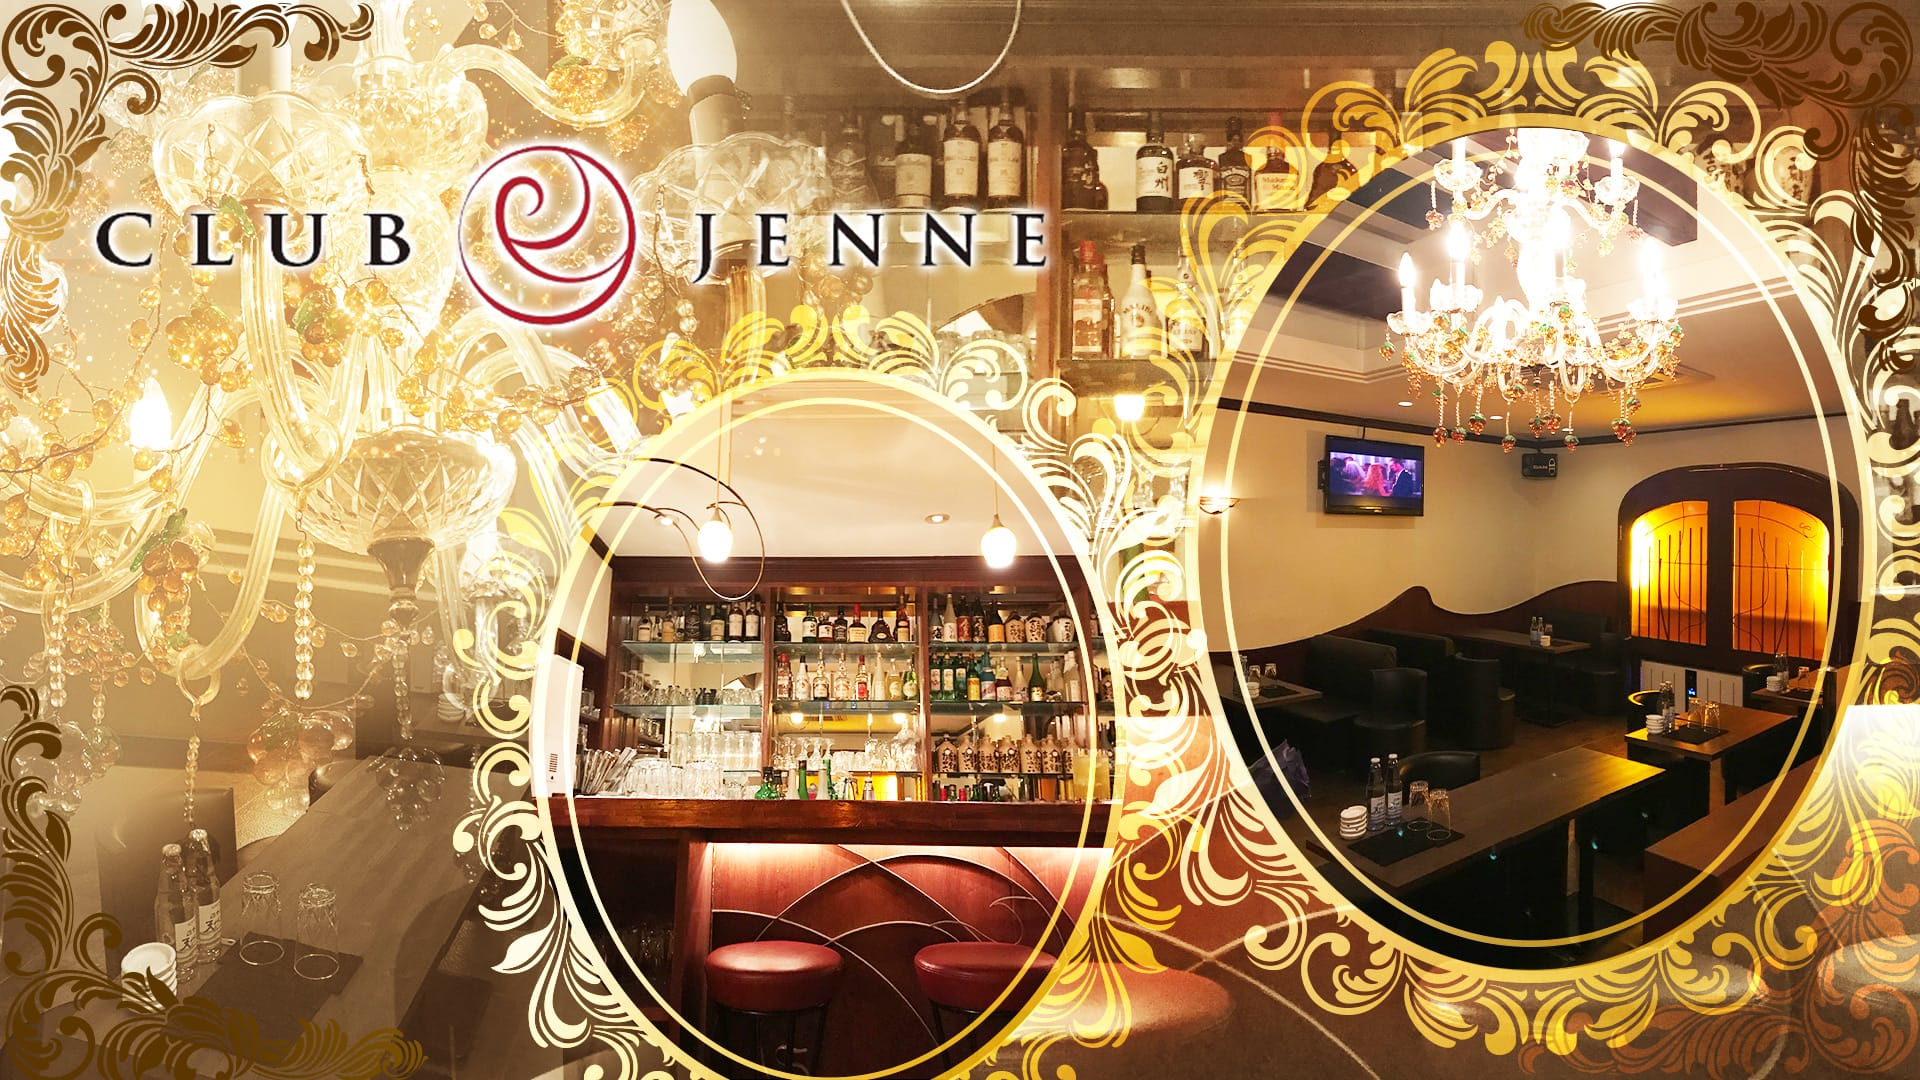 CLUB JENNE(クラブジェンヌ) 草加キャバクラ TOP画像